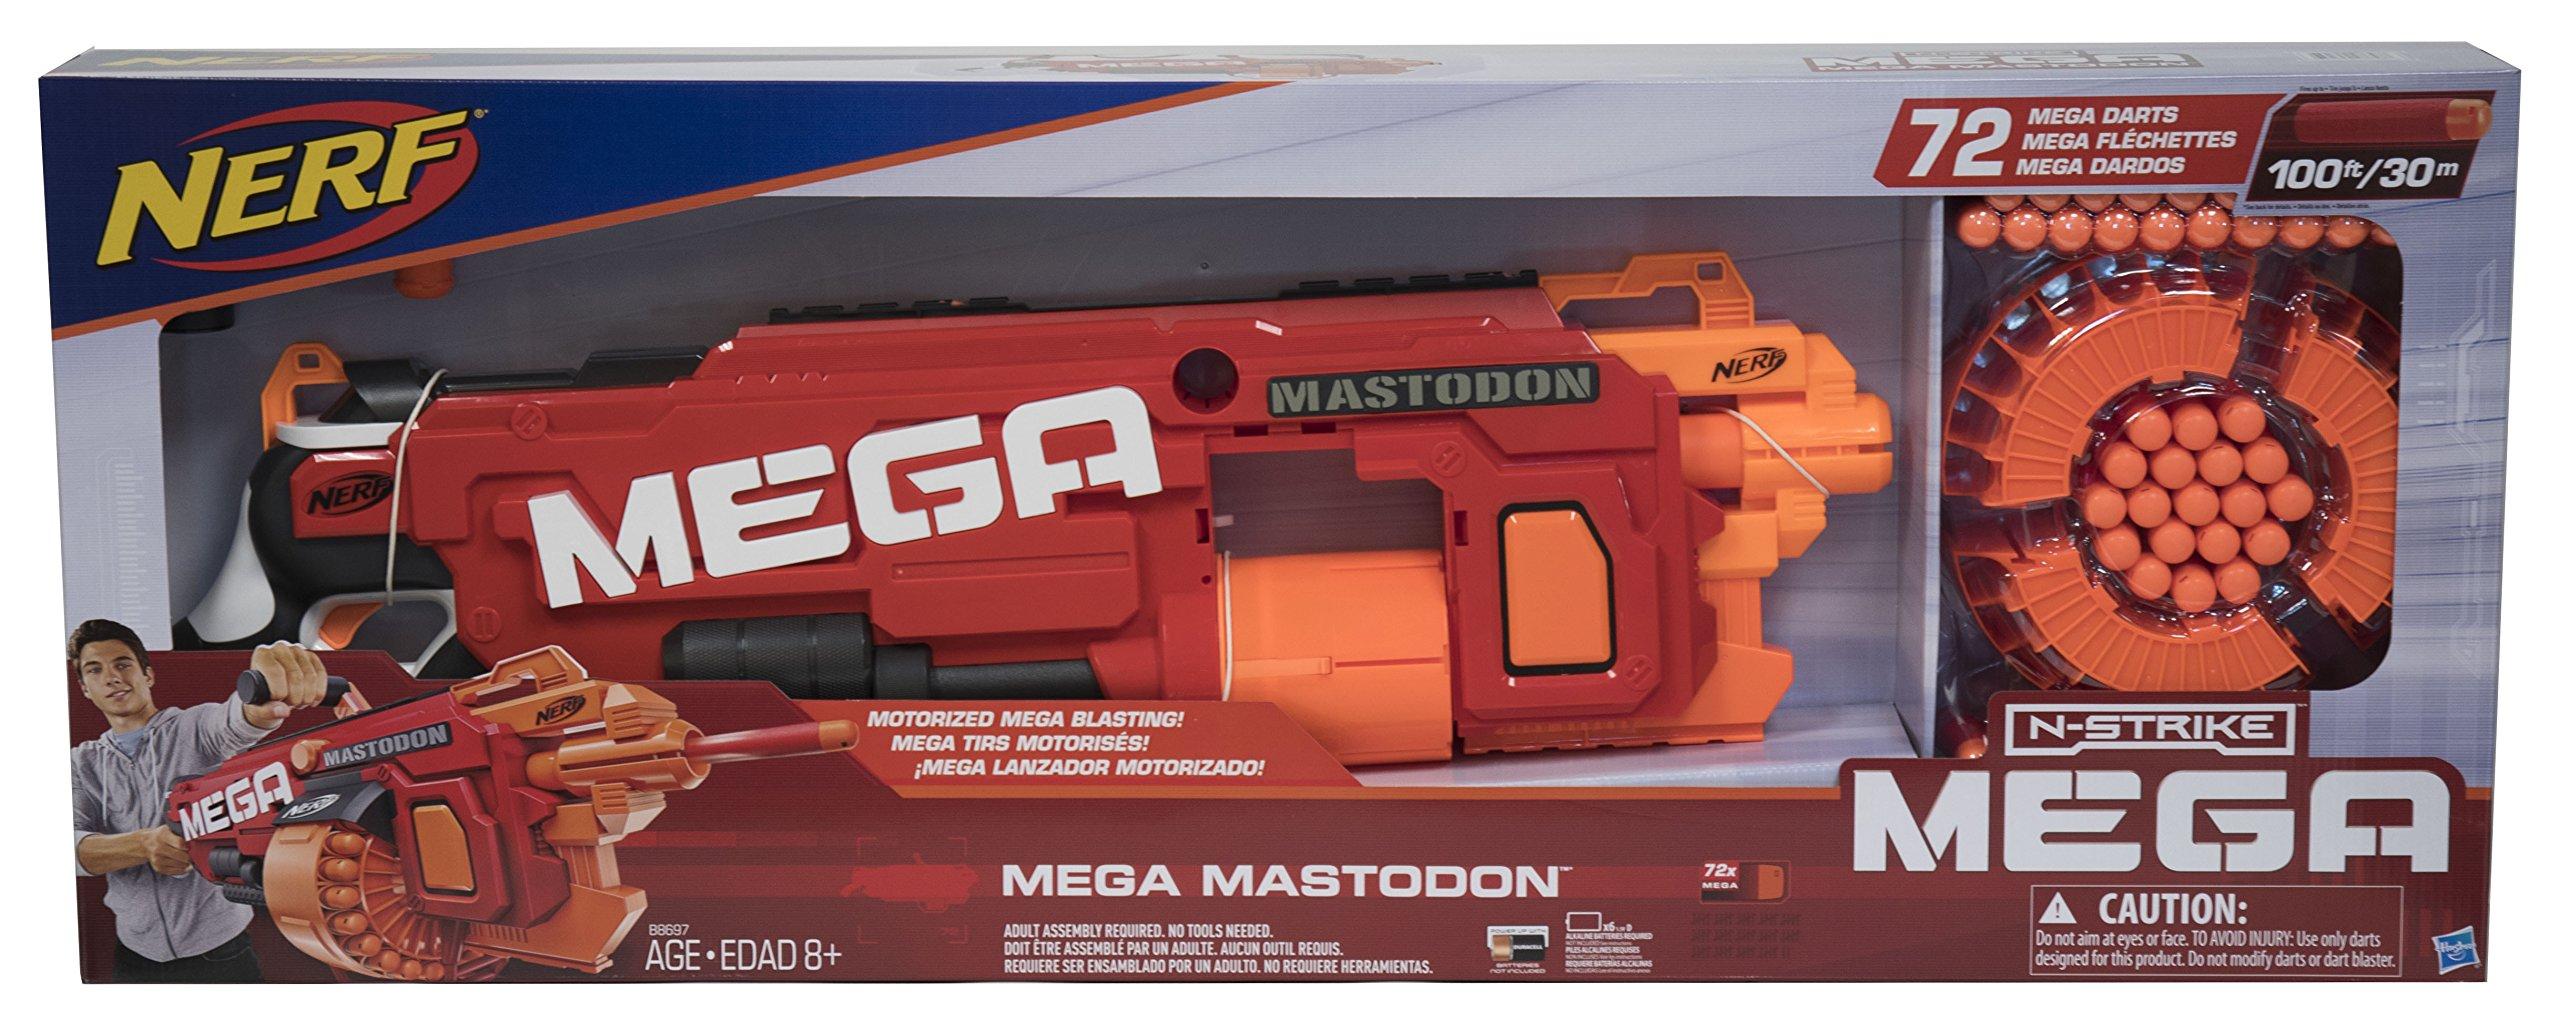 Nerf N-Strike Mega Mastodon Mega Blaster and 72 Mega Darts